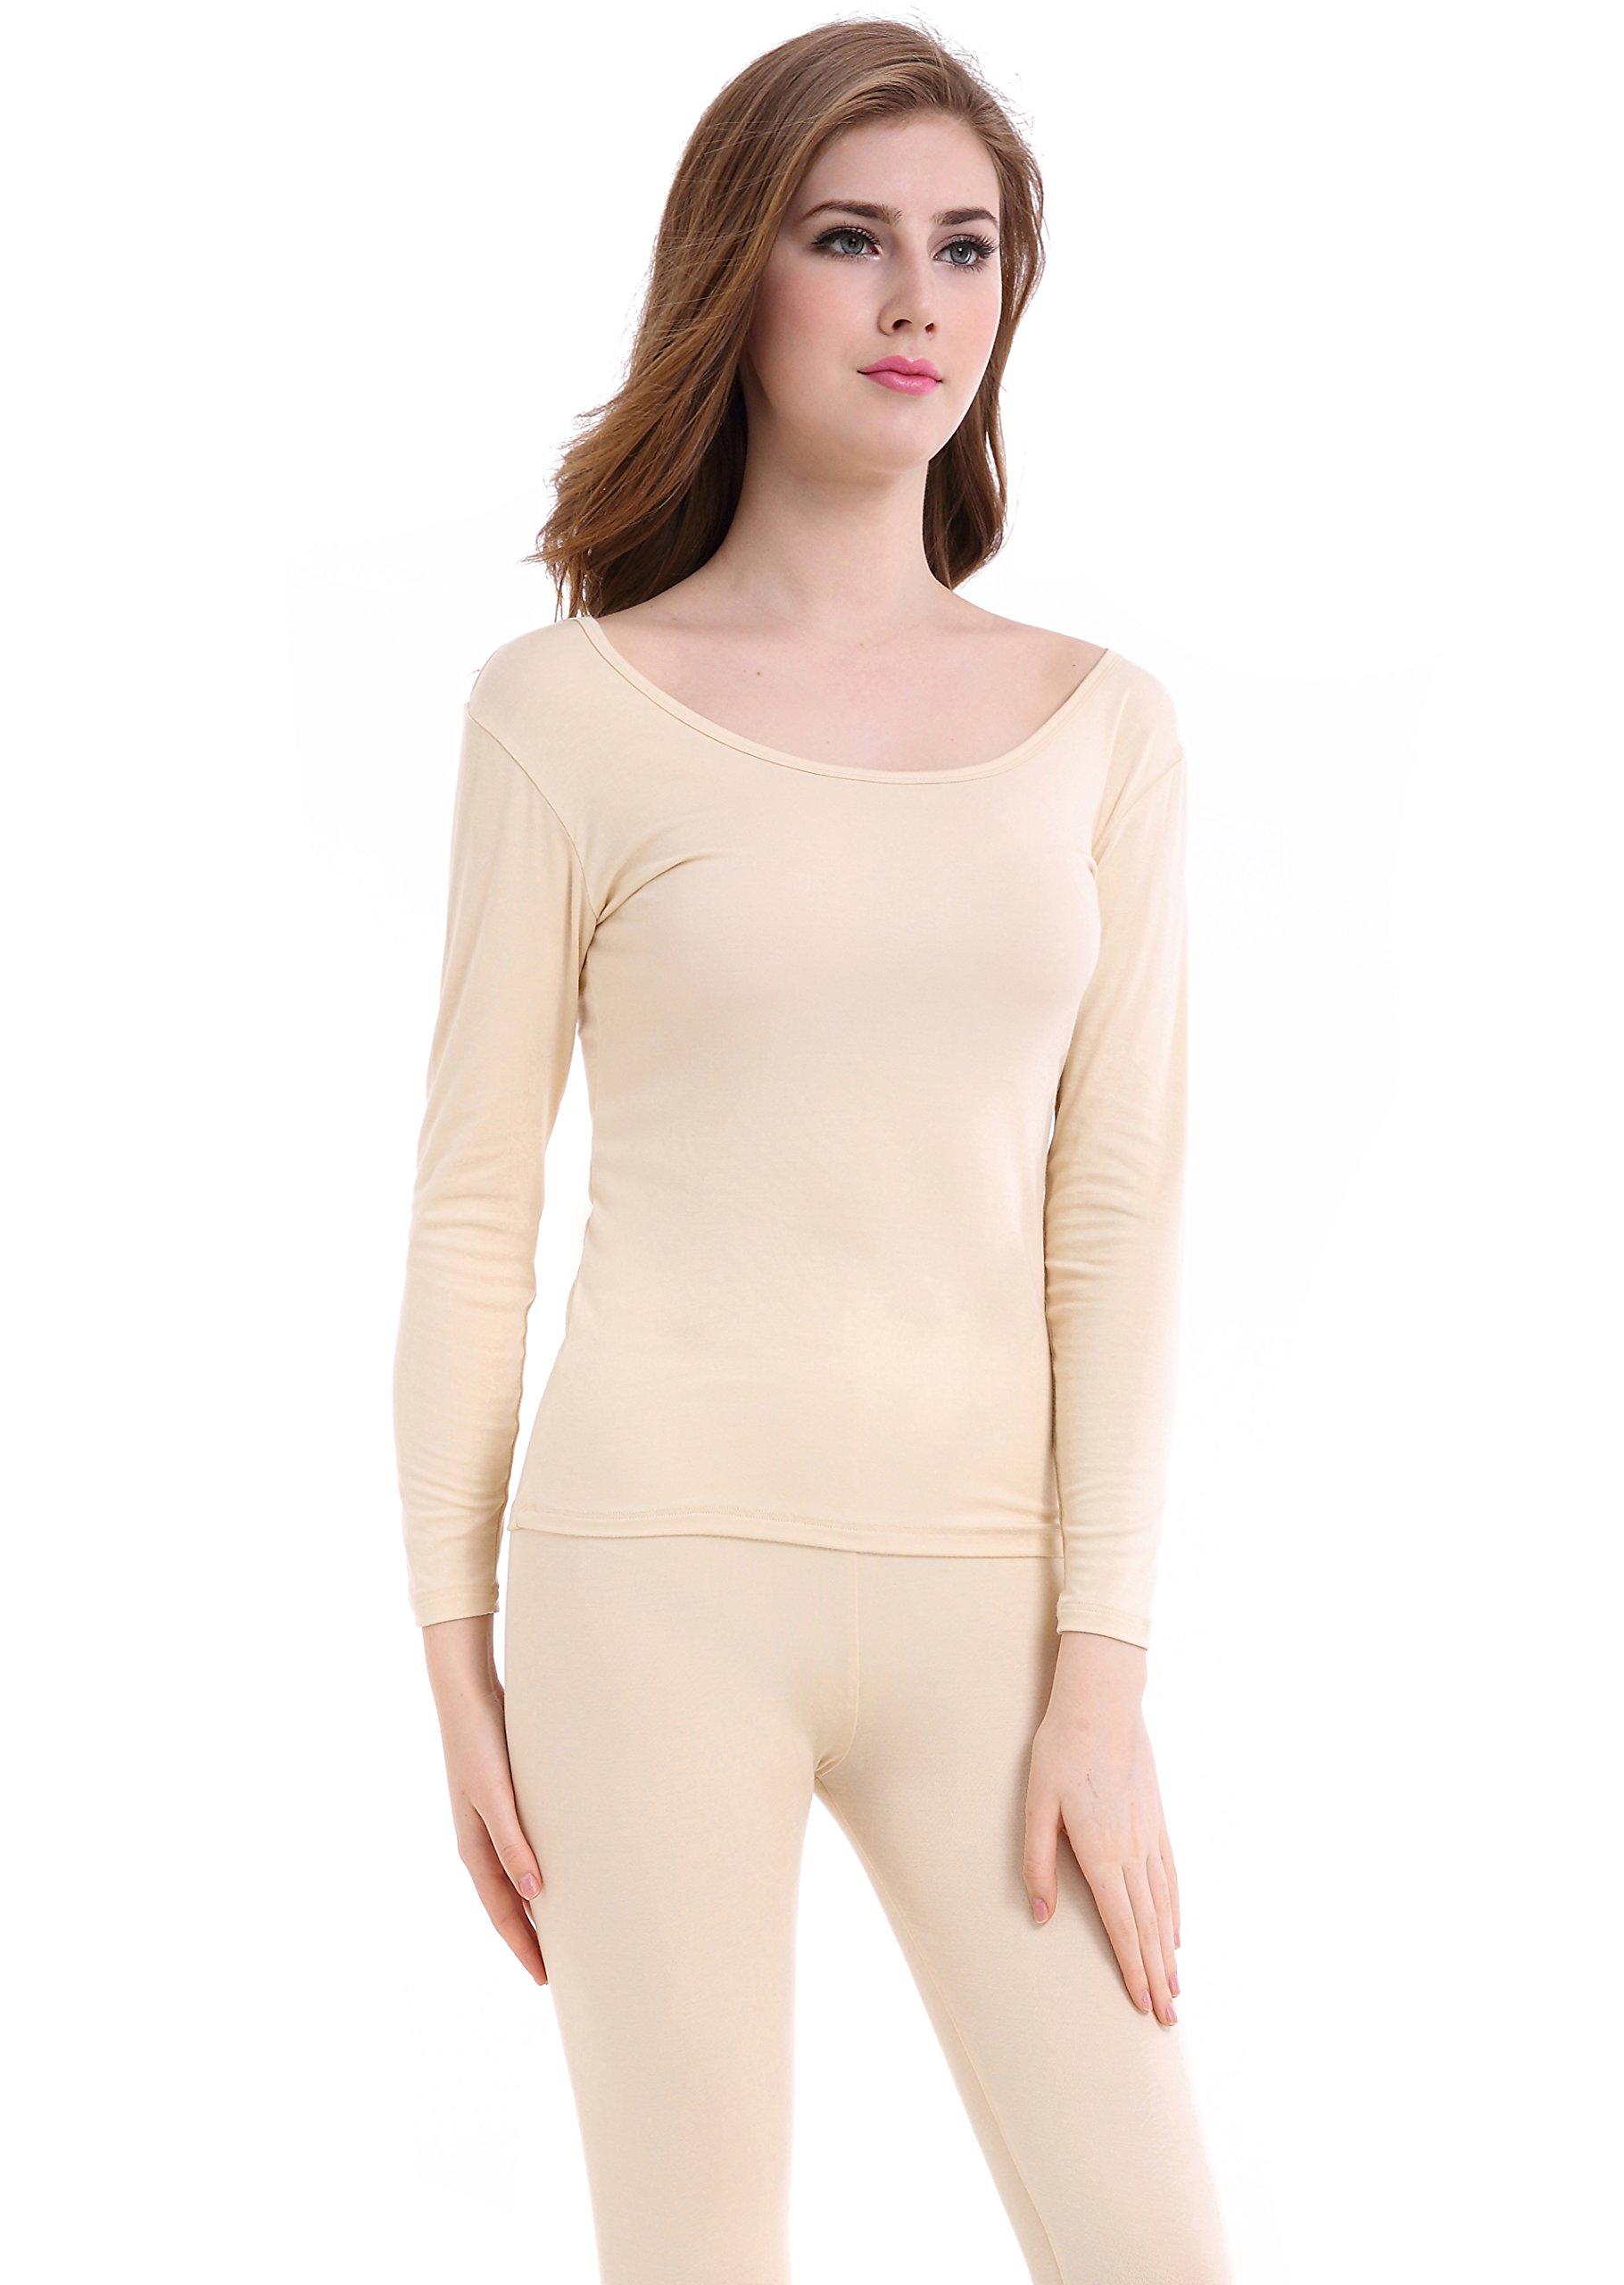 Women Long Johns Crew Neck Thermal Underwear Thin Lightweight Base Layer Set